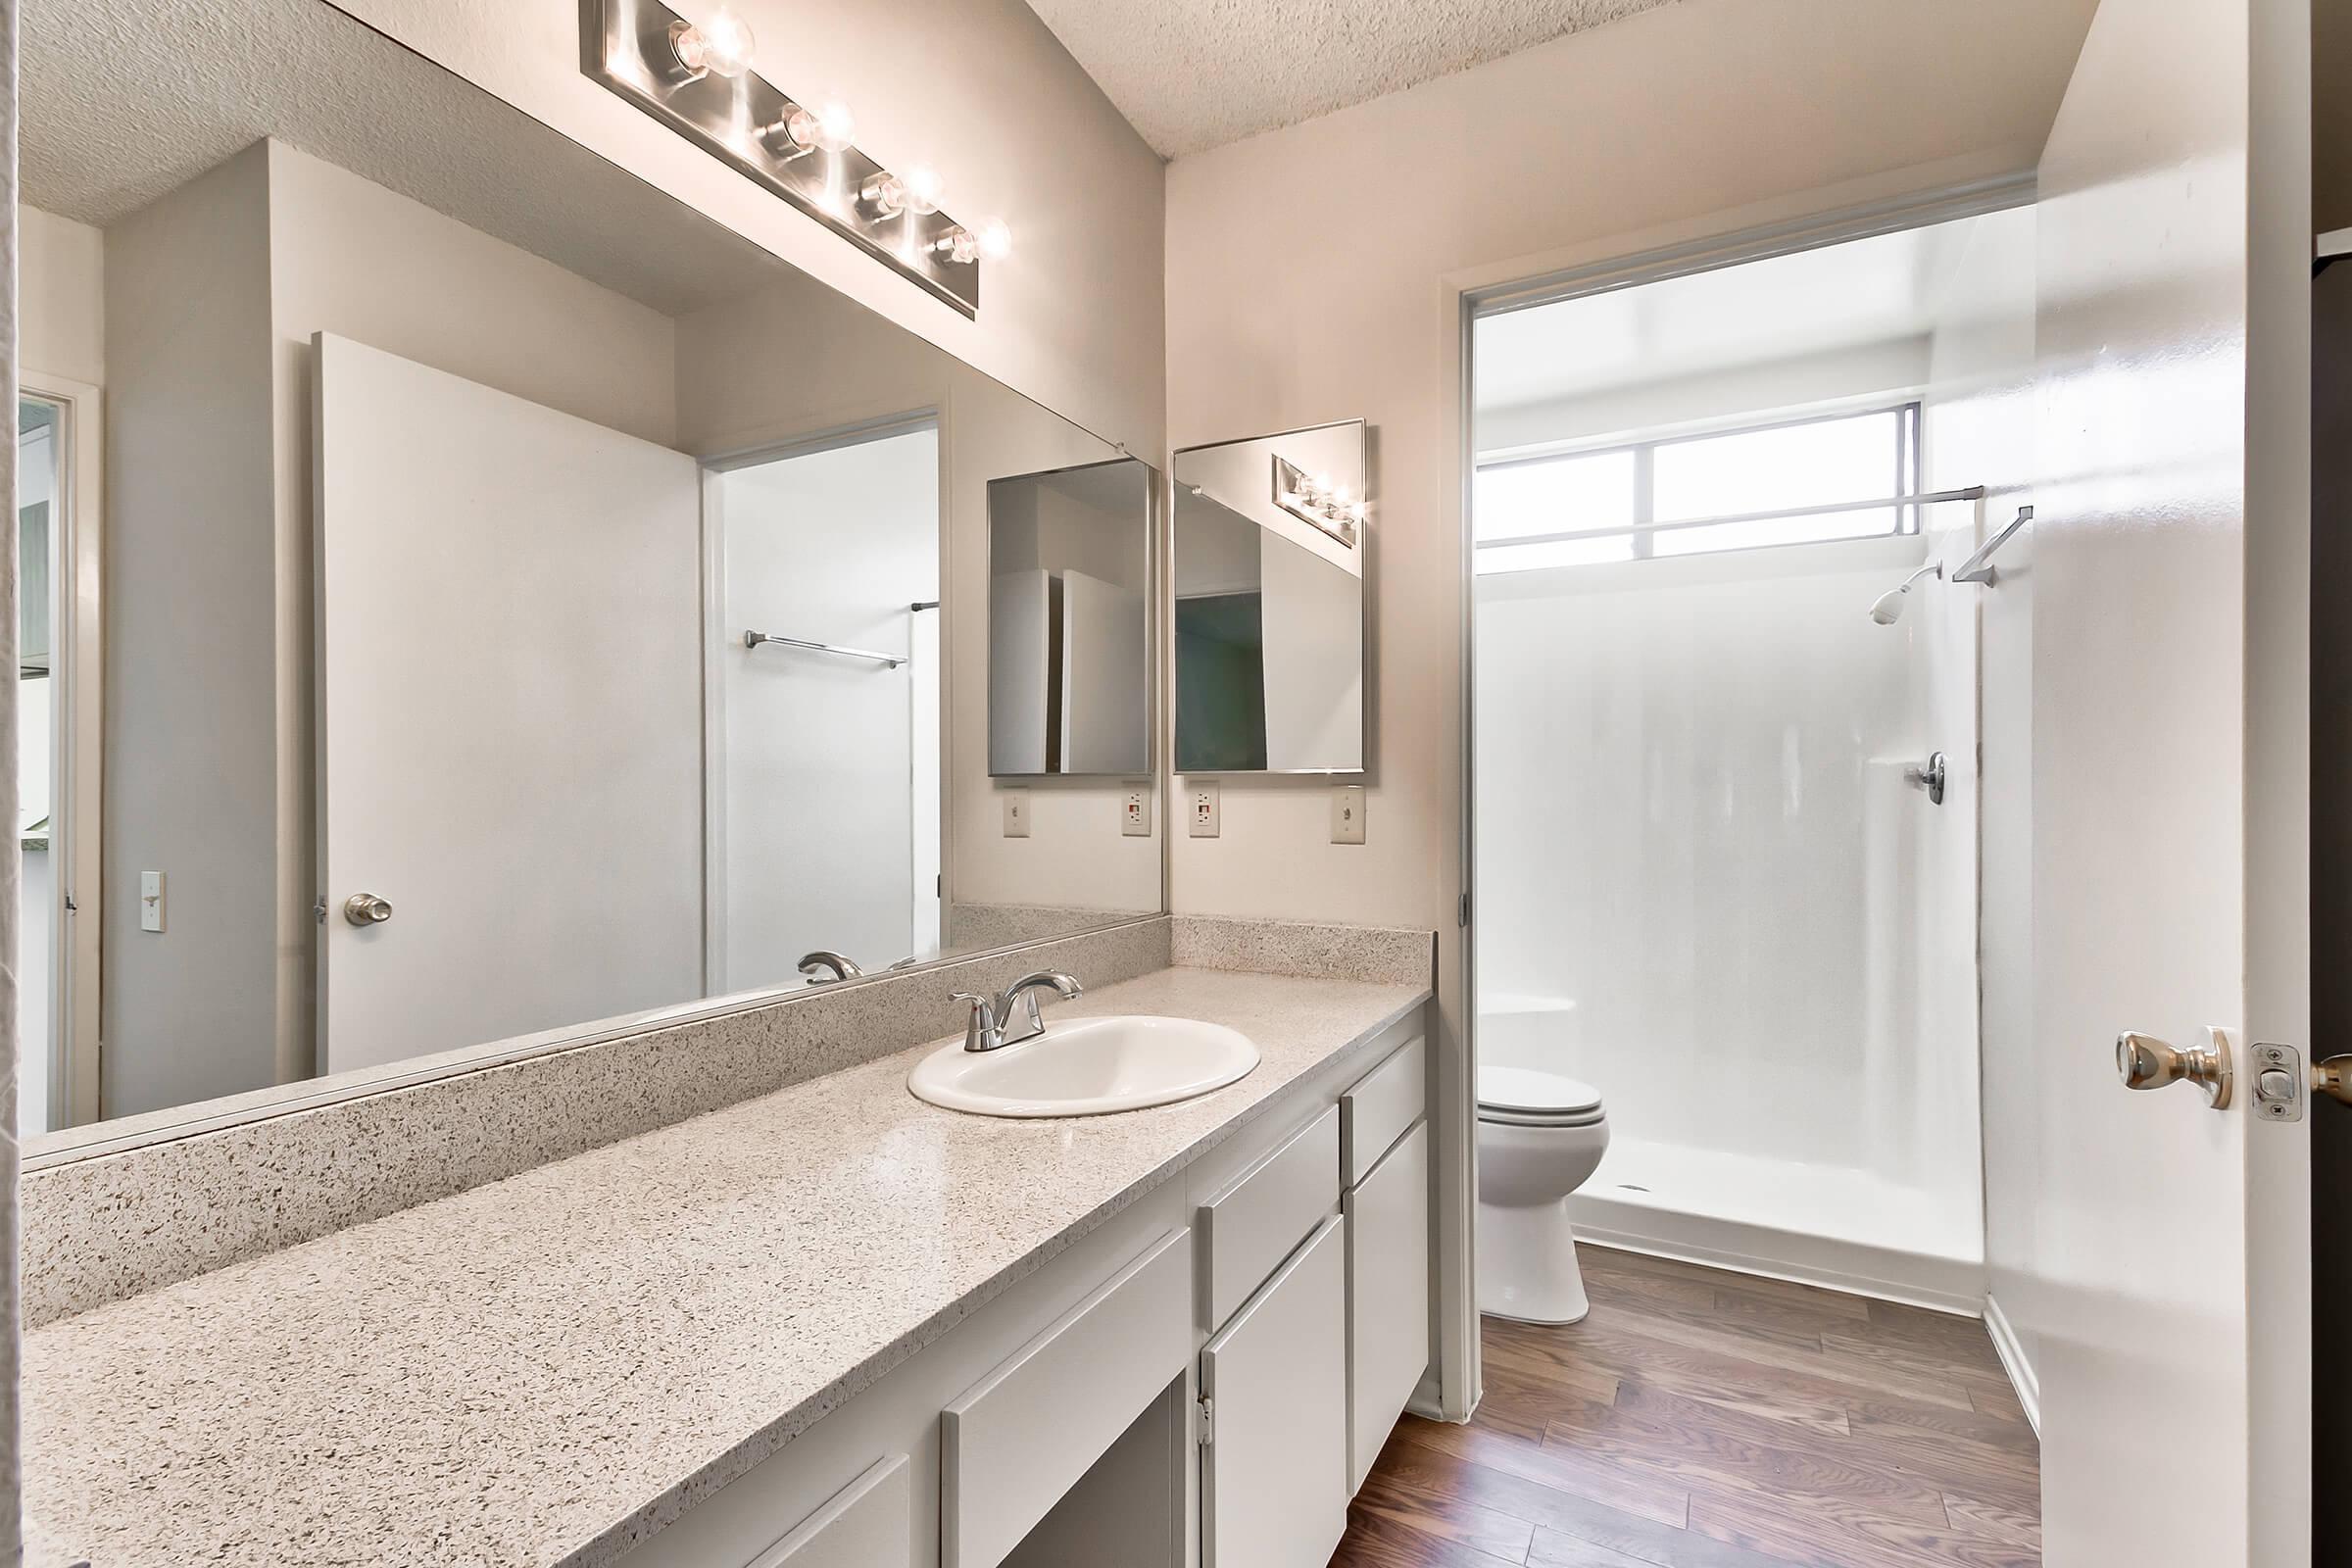 Bathroom_1207-21ST-AVE-NE-HICKORY-NC-28601-1872_HUNTINGTON-PARK-APTS_RPI_II-273044-55.jpg